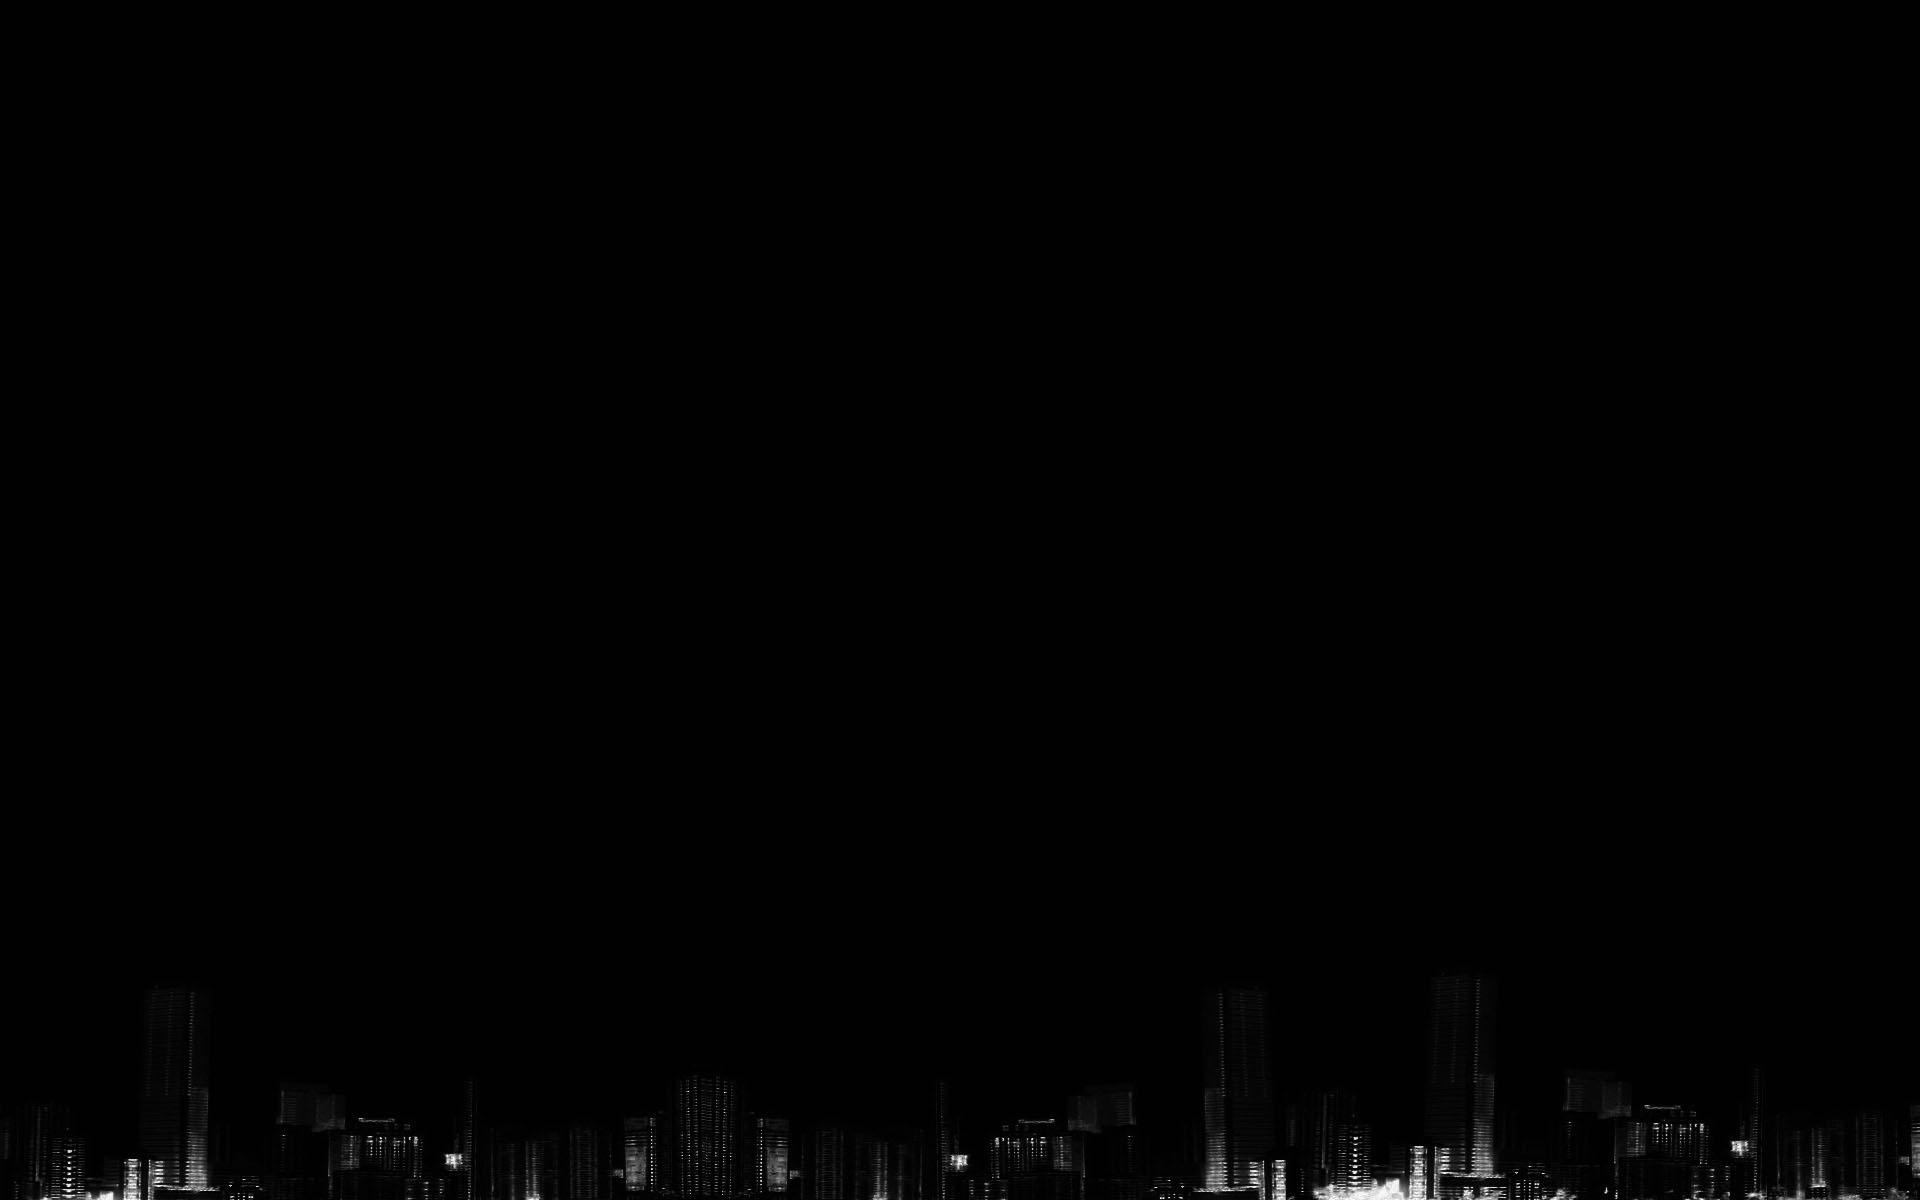 desktop-background-black-HD-Black-Desktop-Backgrounds-afari-throughout-Desktop-Backgro-wallpaper-wpc5804032